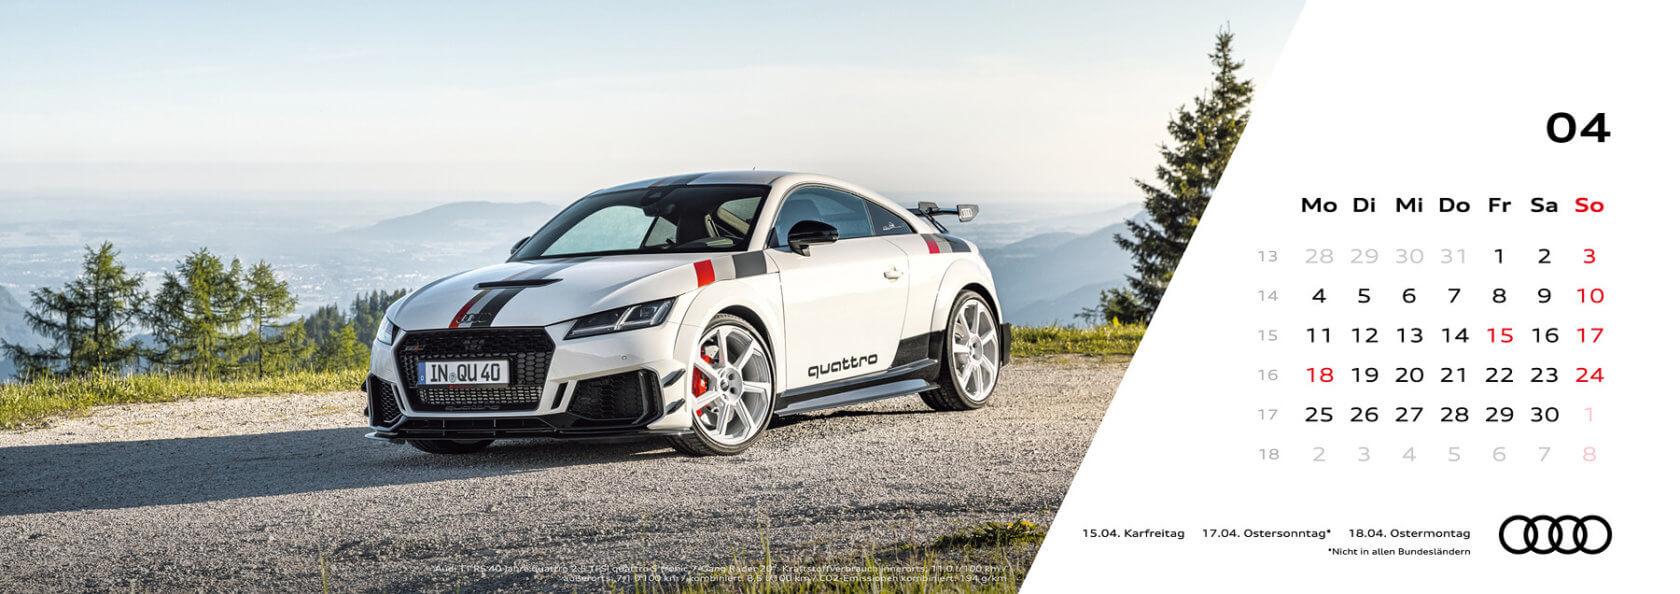 Audi Tischkalender 2022 - April